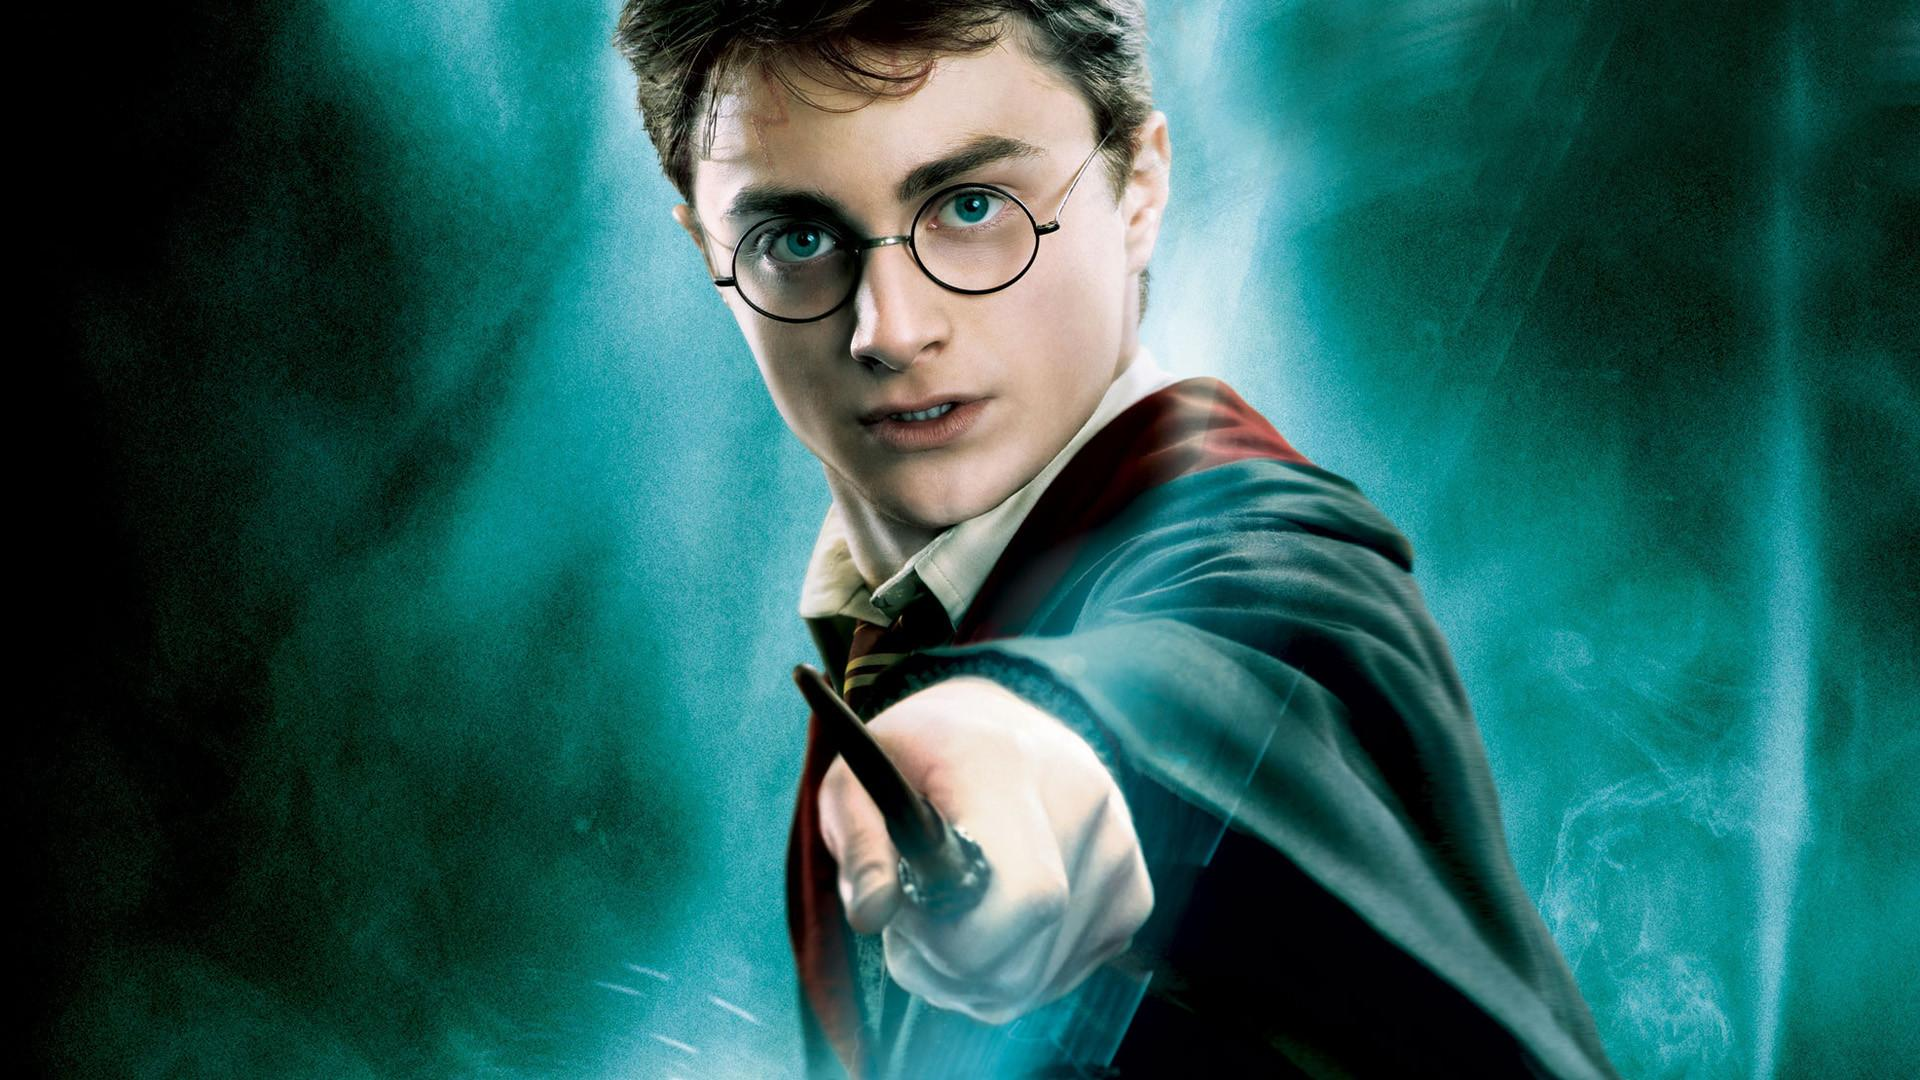 Harry Potter Magic Wand Blank Template Imgflip